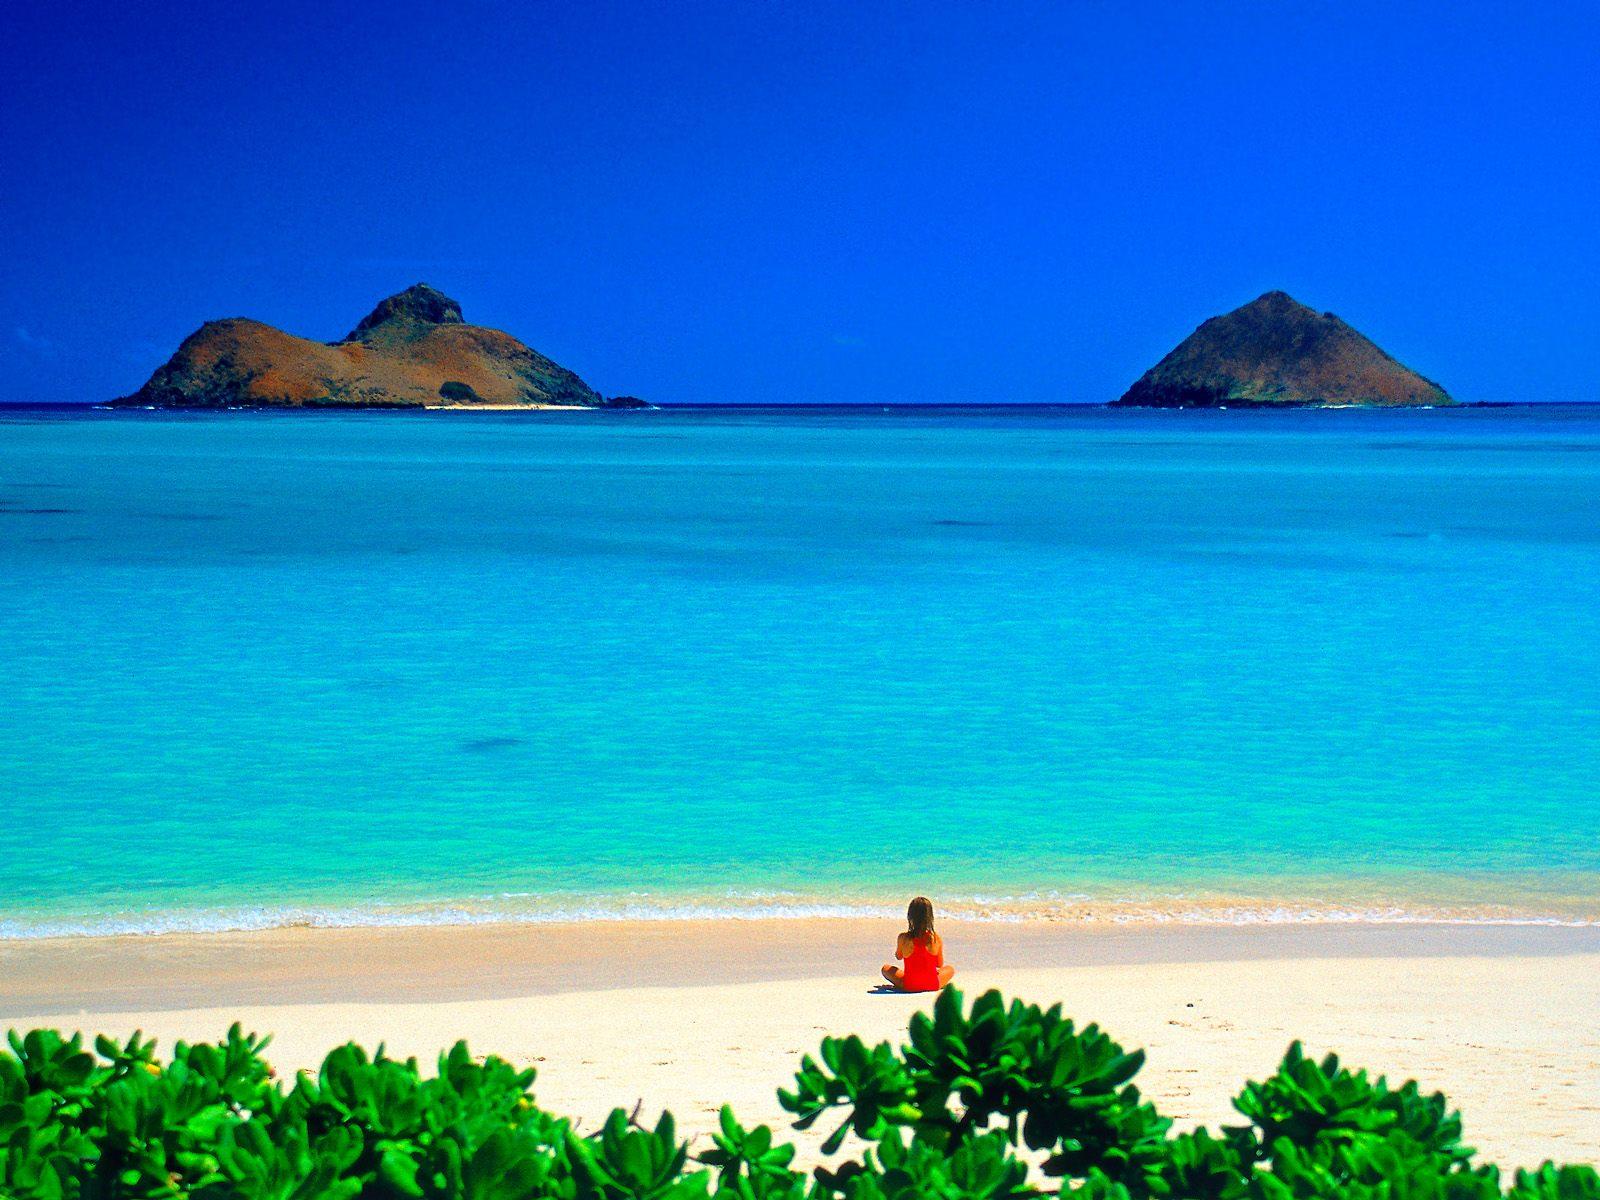 Me ane te nje fotoje tregoni se ku do te deshironit te ishit ne keto momente? Lanikai-beach-oahu-hawaii